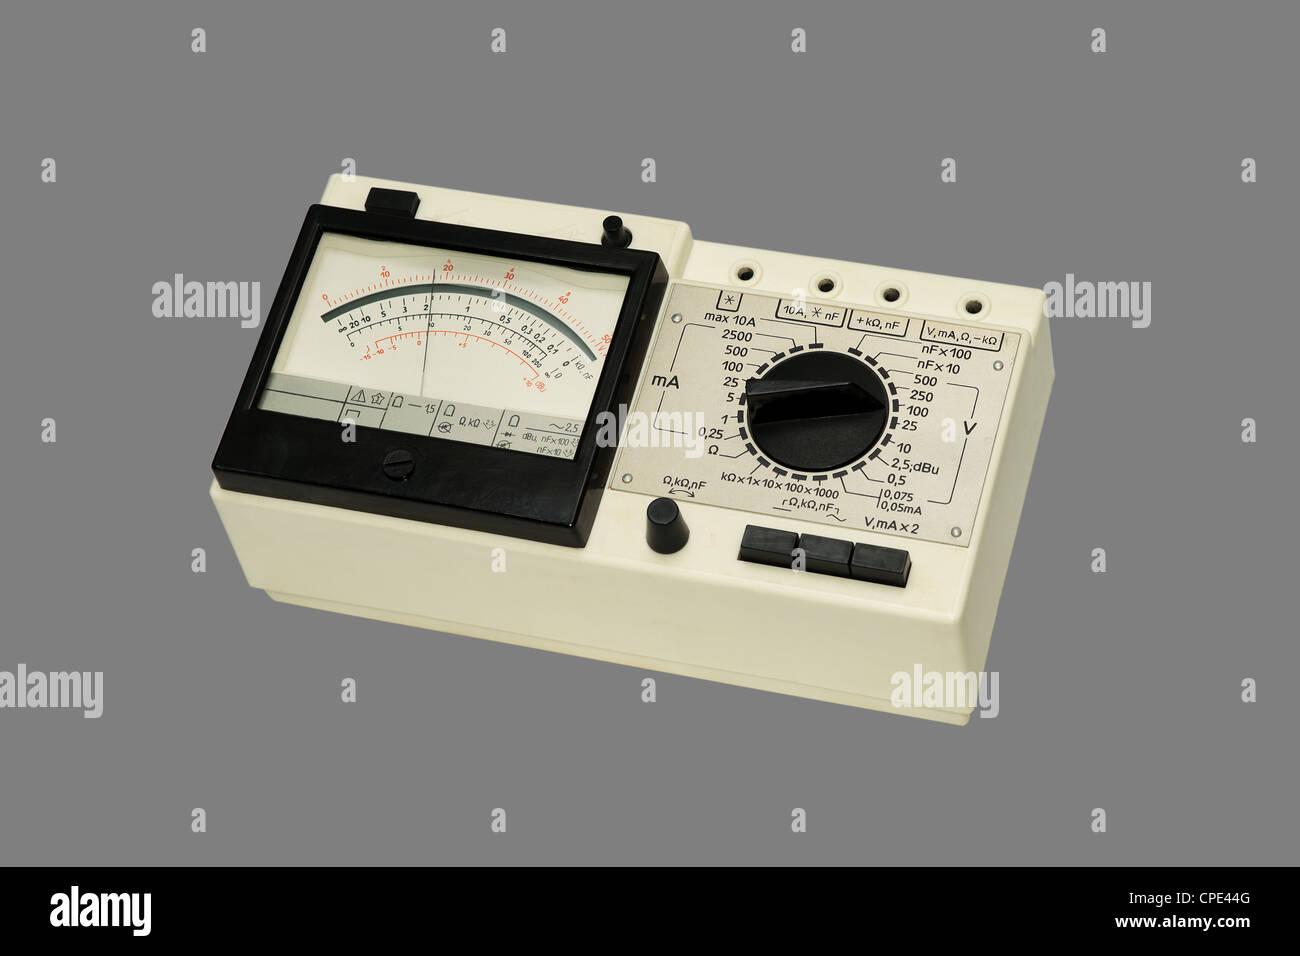 amperage, analog, calibration, conductivity, display, electrical, electronic, equipment, impedance, instrument, - Stock Image